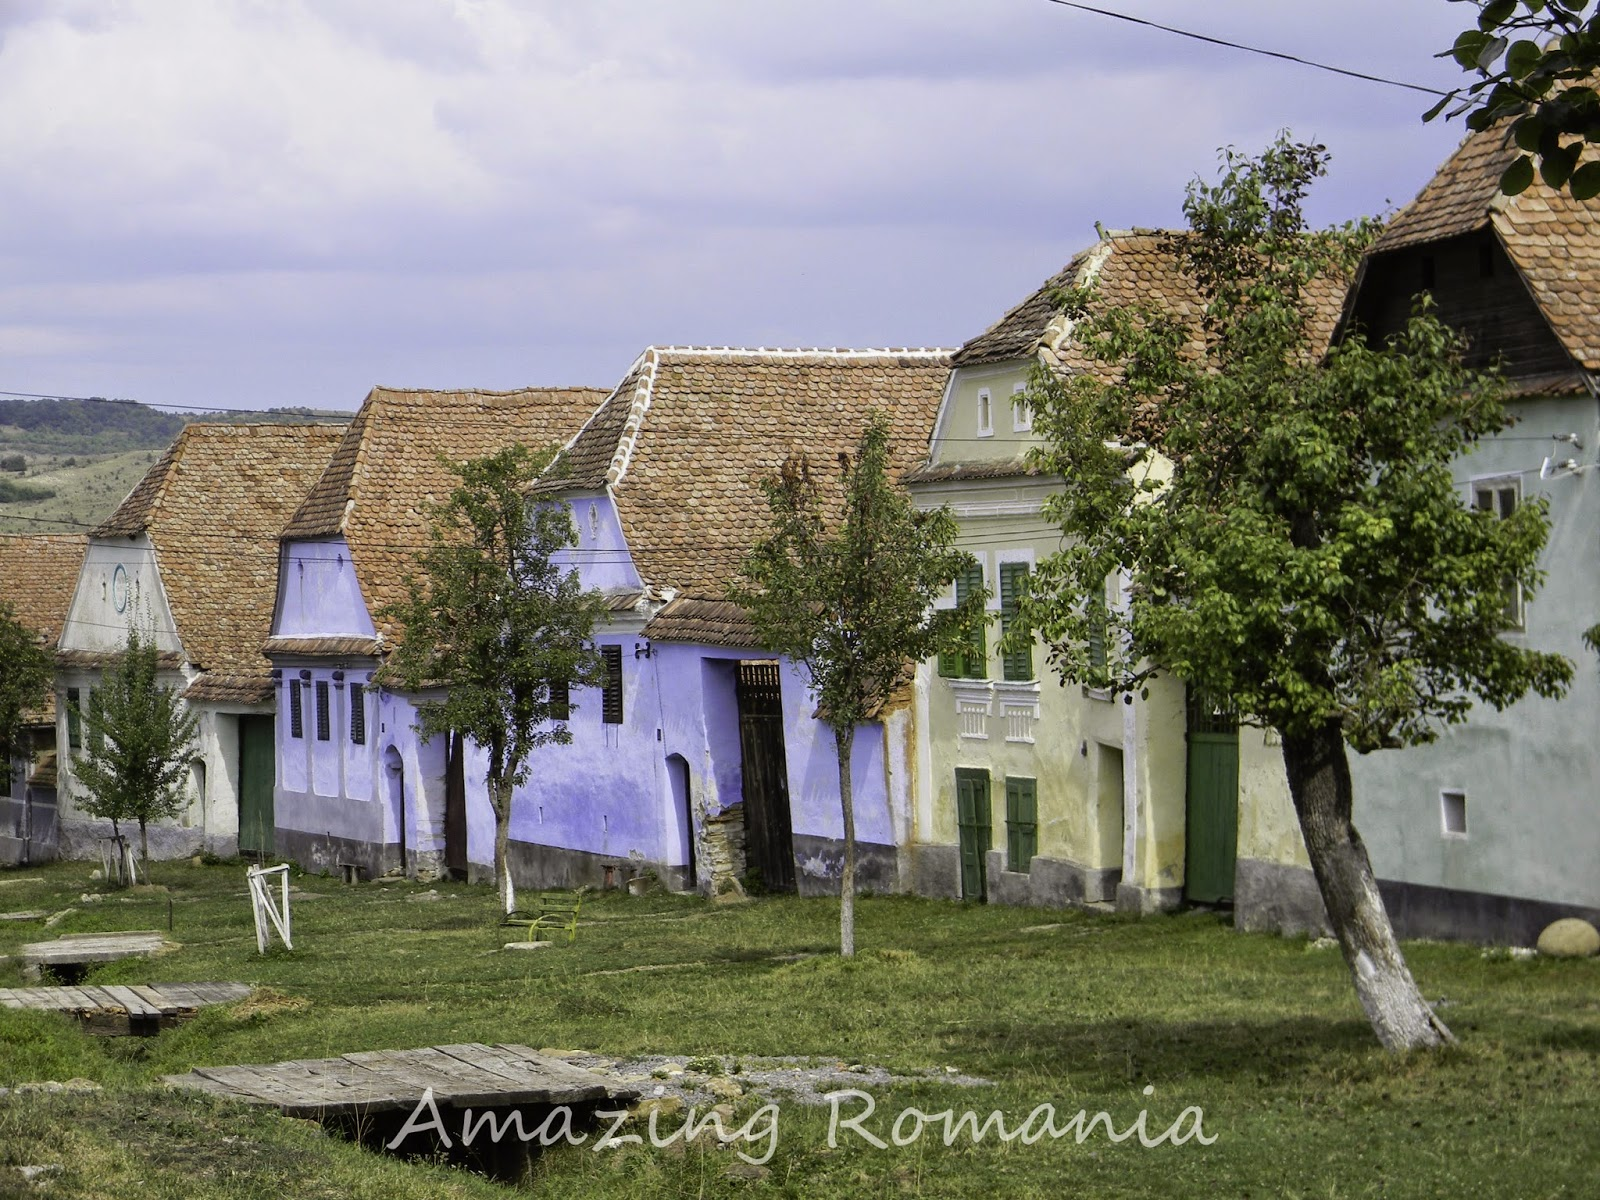 Amazing romania viscri prin ul charles printre colinele transilvaniei - Saxon style houses in transylvania ...